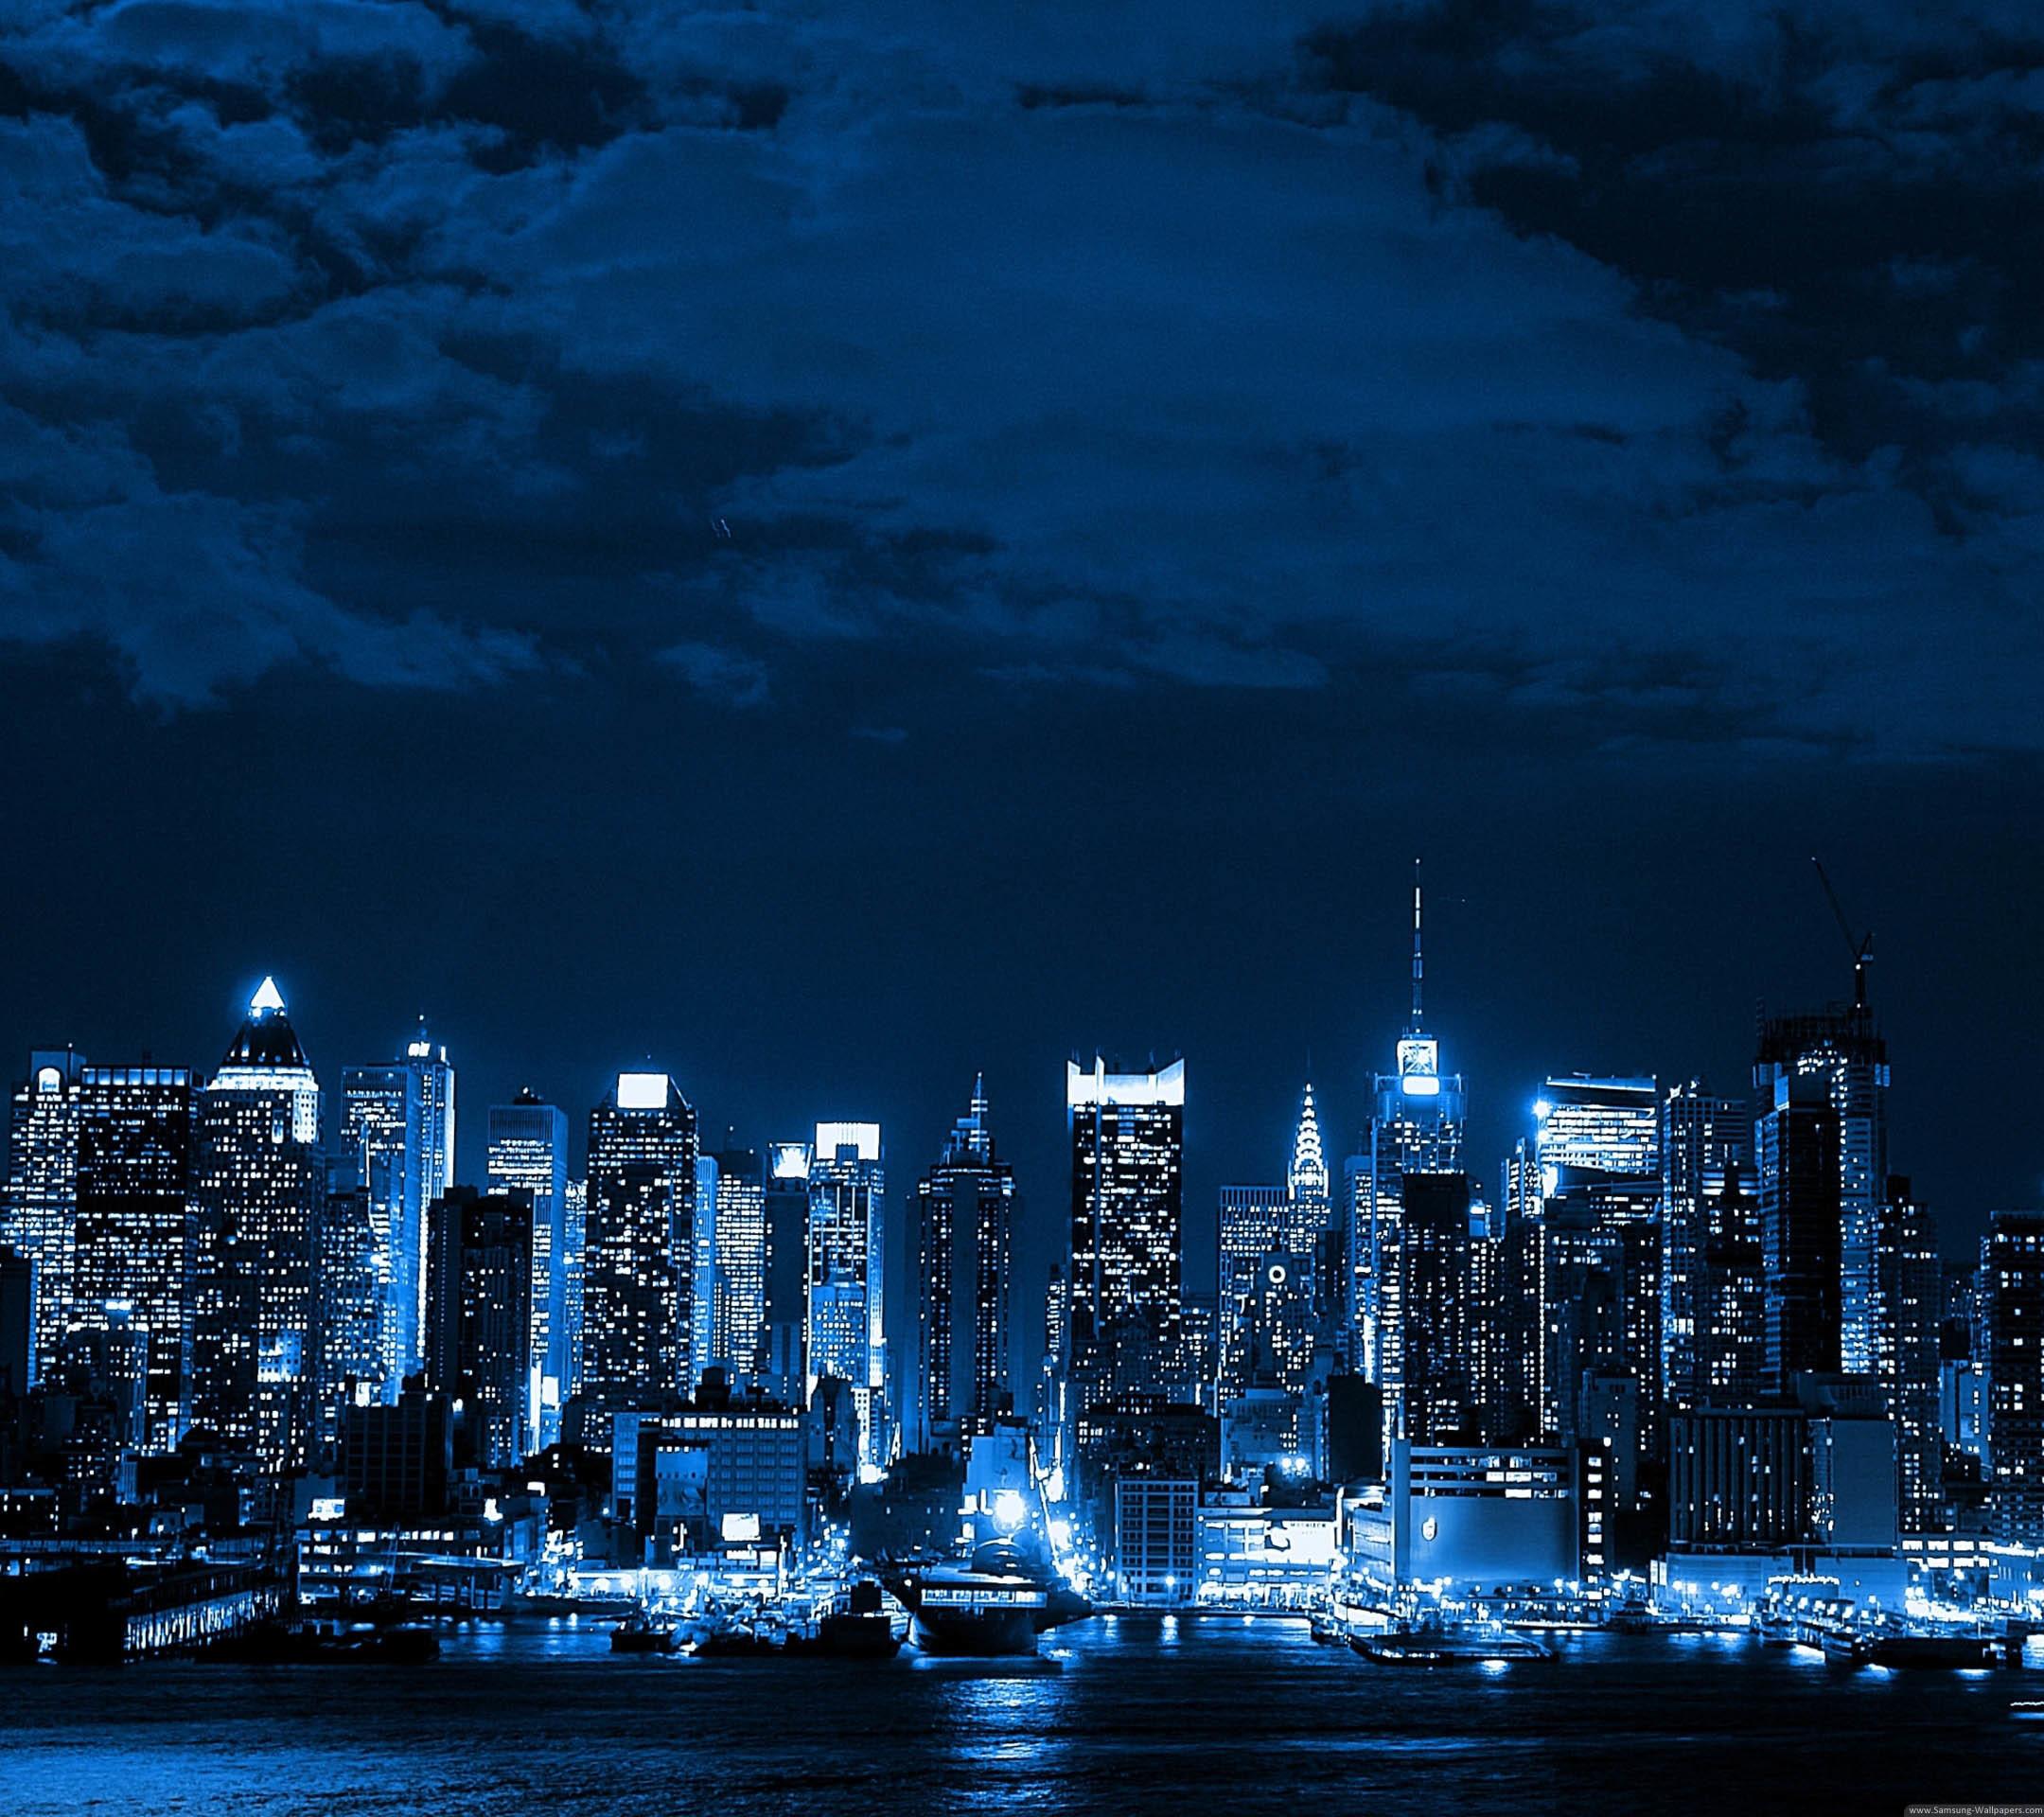 City Night Desktop for Galaxy Note 3 Wallpaper HD